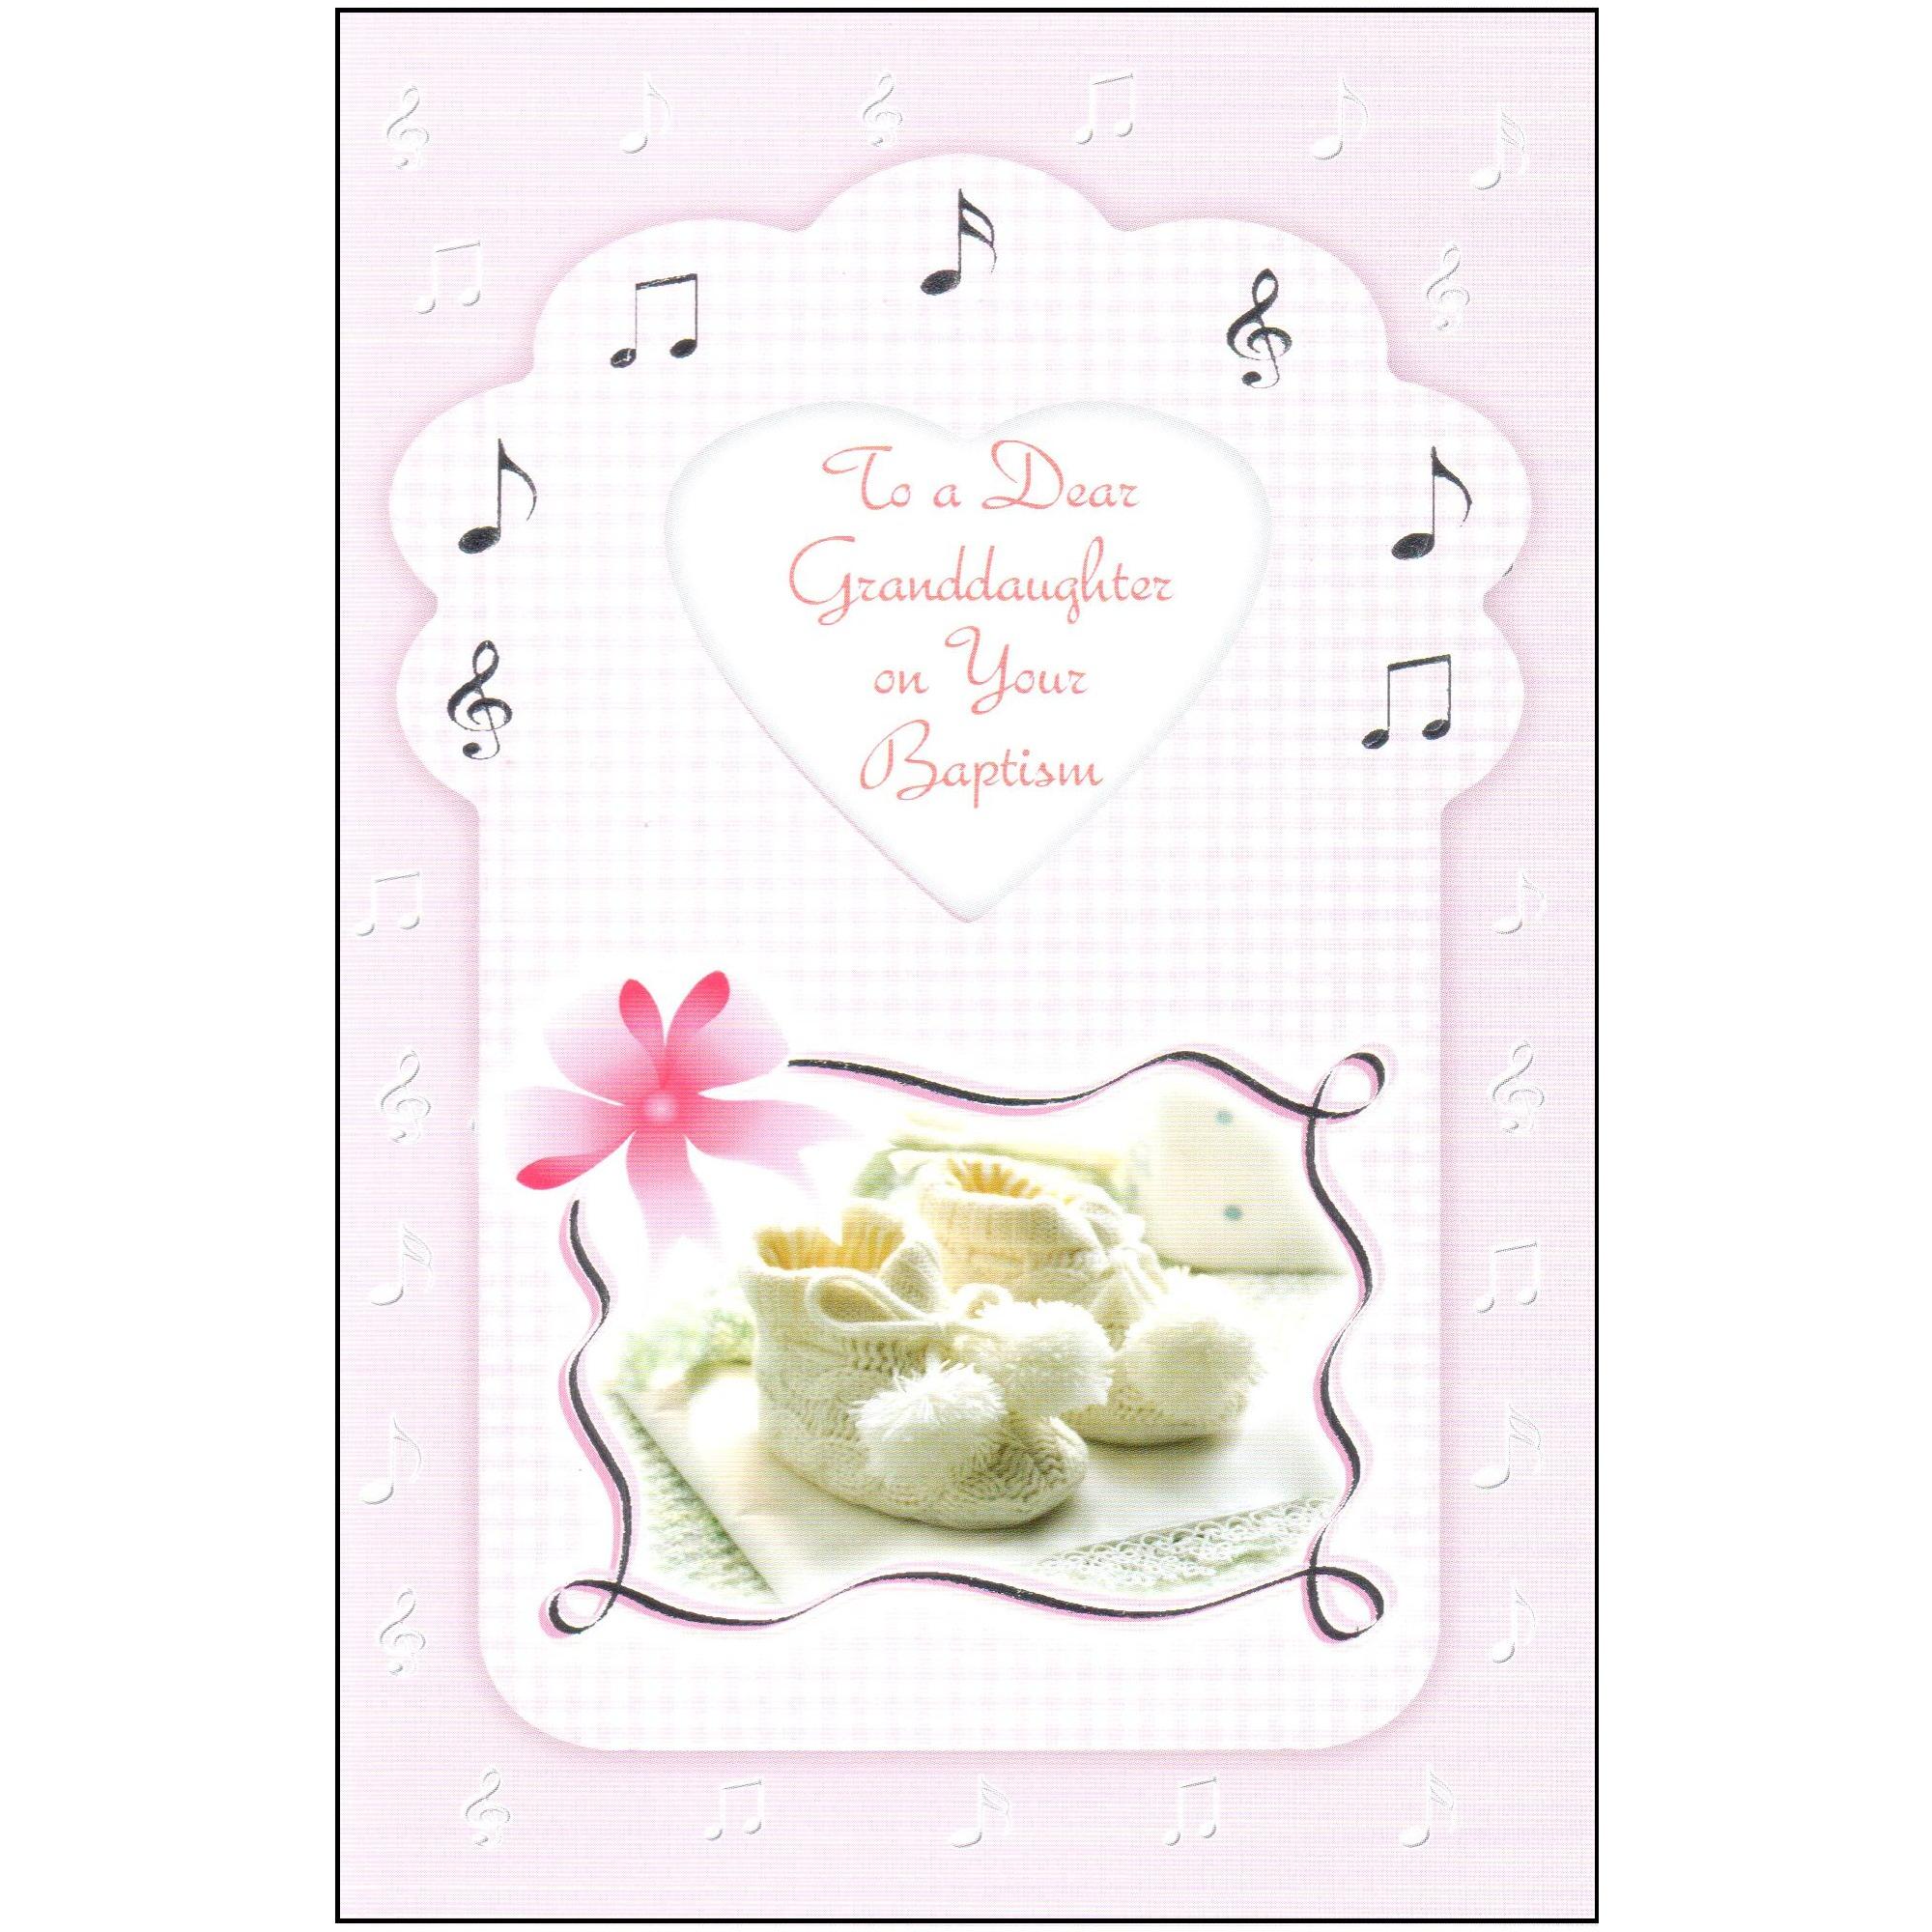 Baptism Greeting Card - Granddaughter | The Catholic Company - Free Printable Baptism Greeting Cards